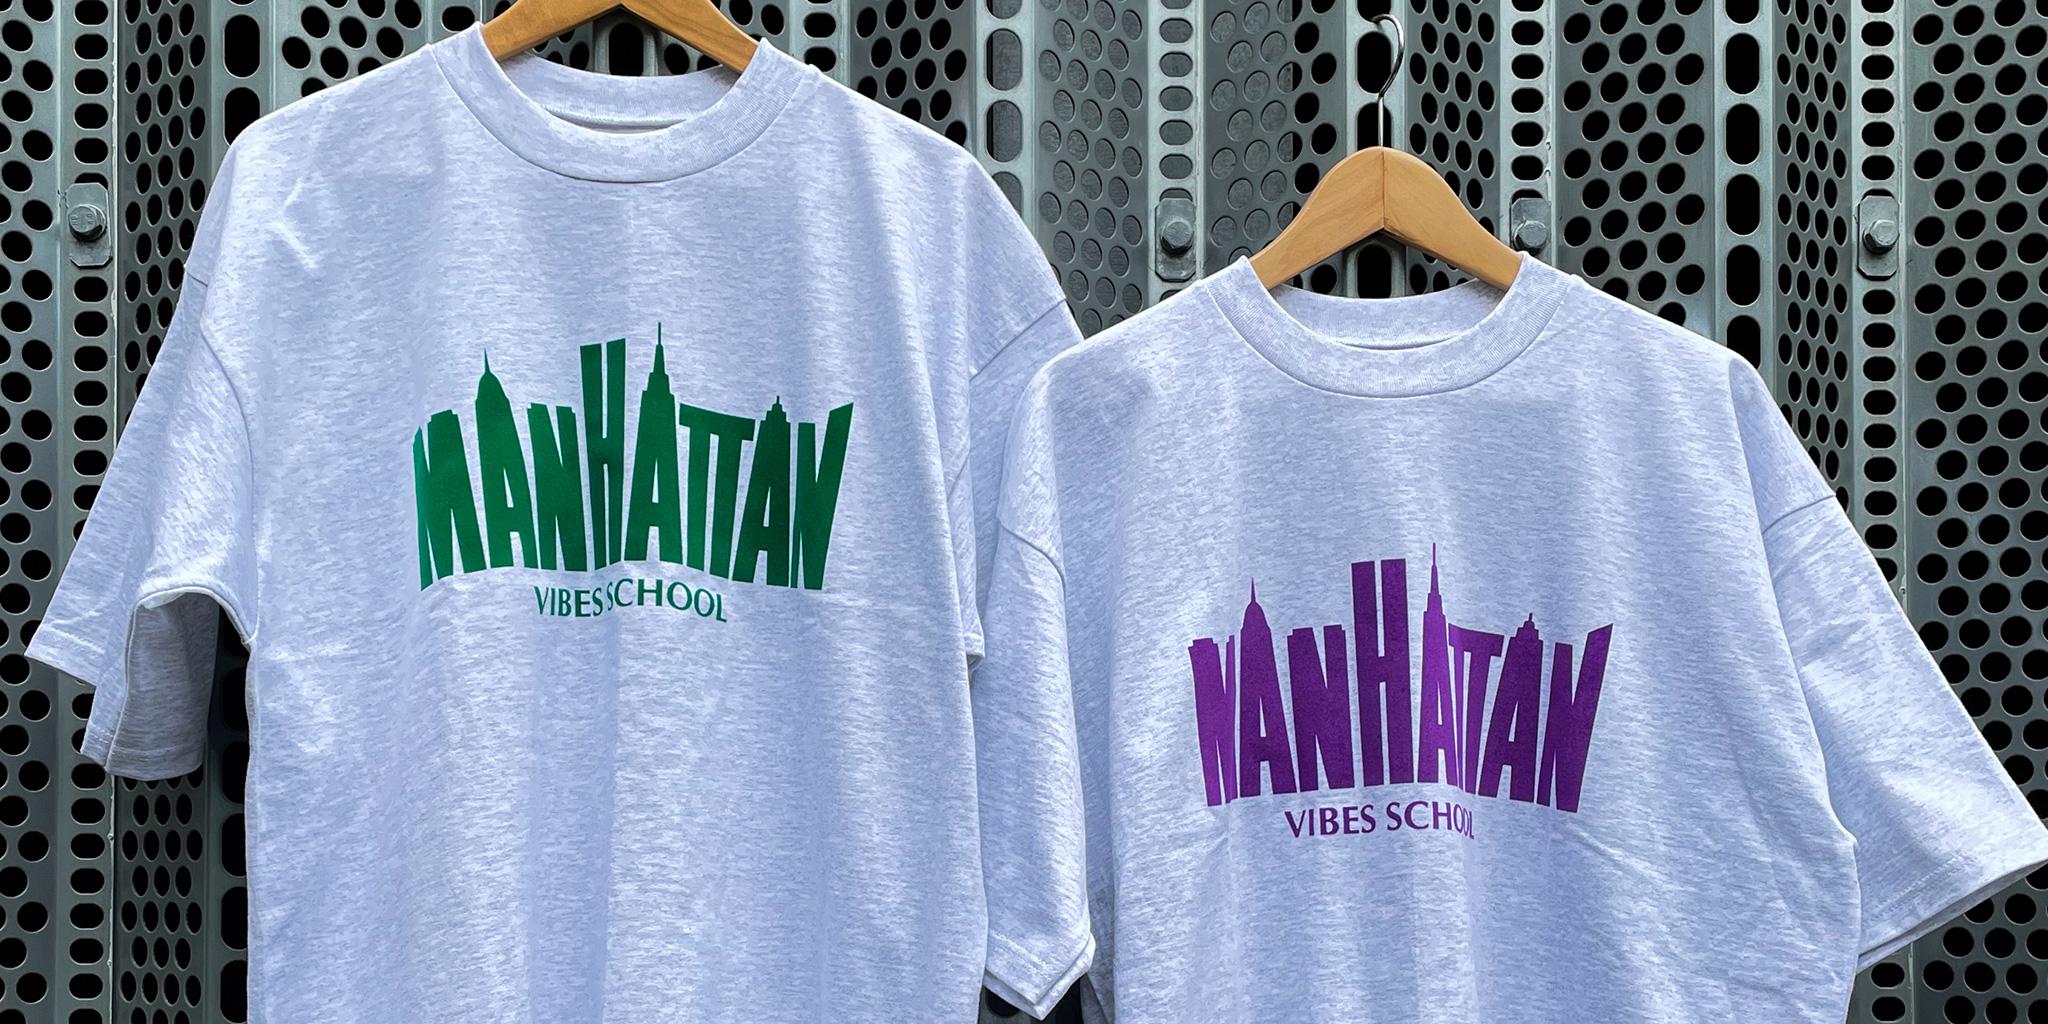 5/22 13:00~販売開始!MANHATTAN VIBES SCHOOL T-SHIRT